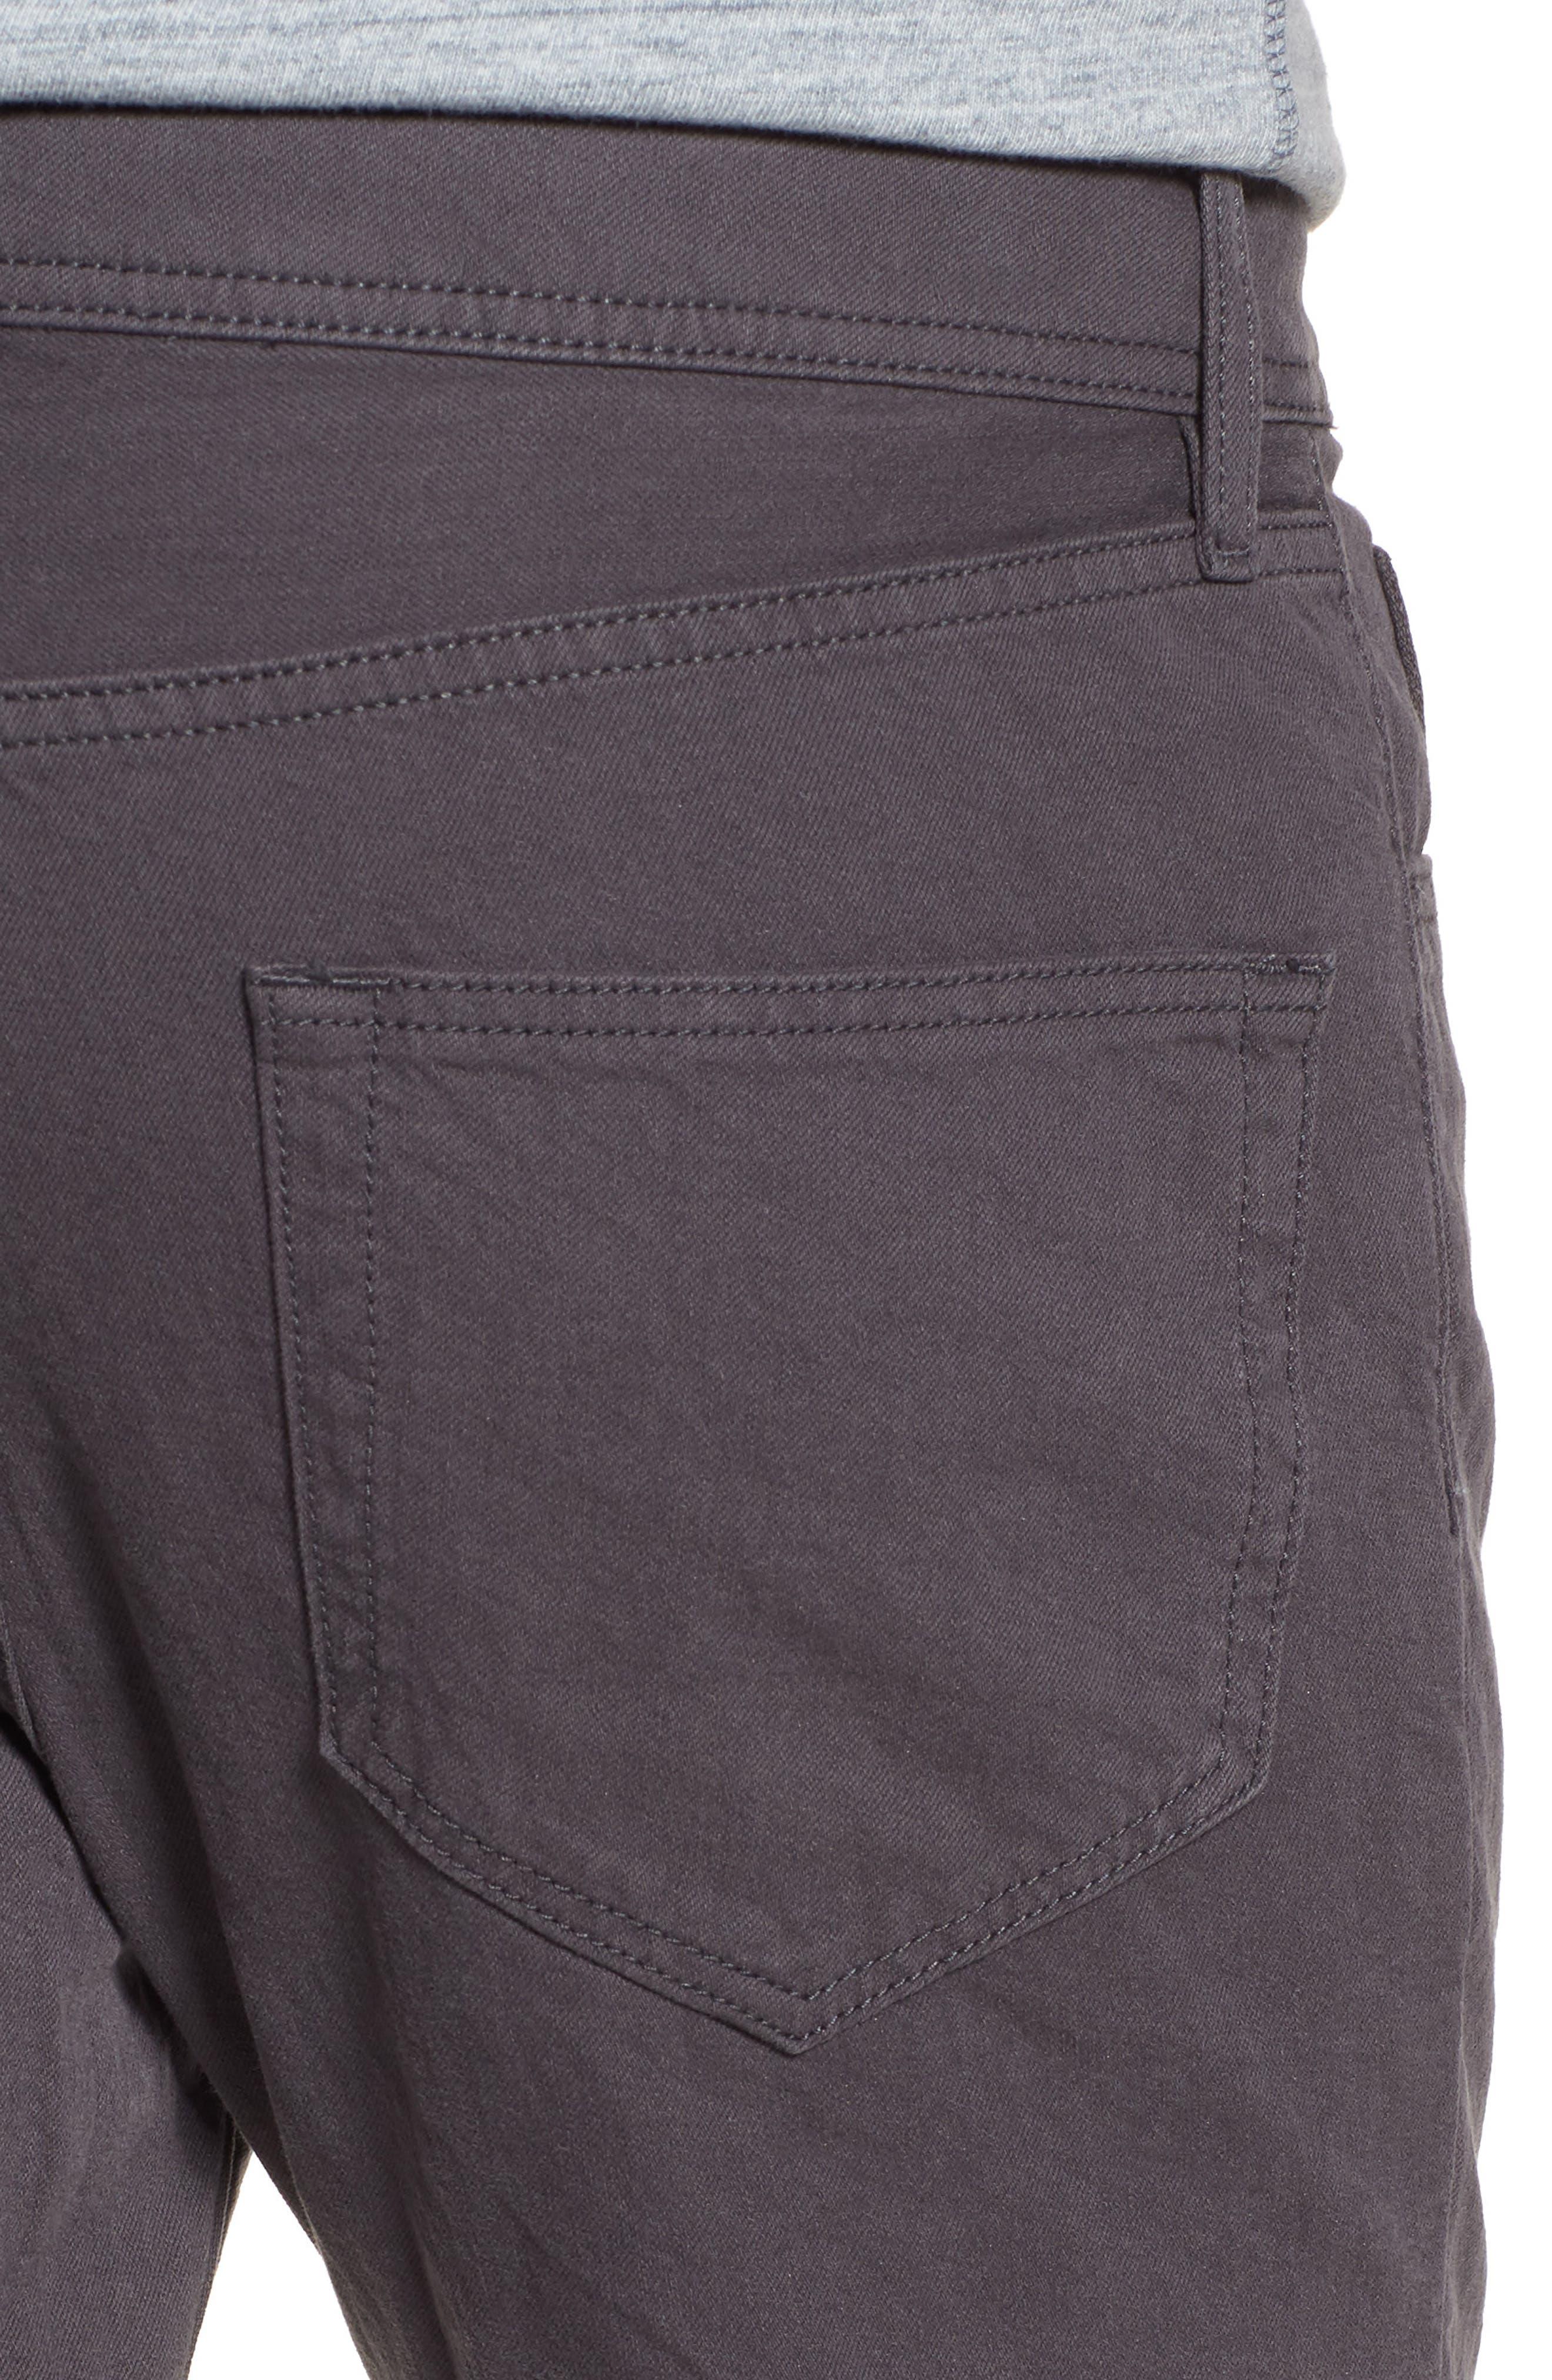 Slim Fit Twill Pants,                             Alternate thumbnail 4, color,                             037